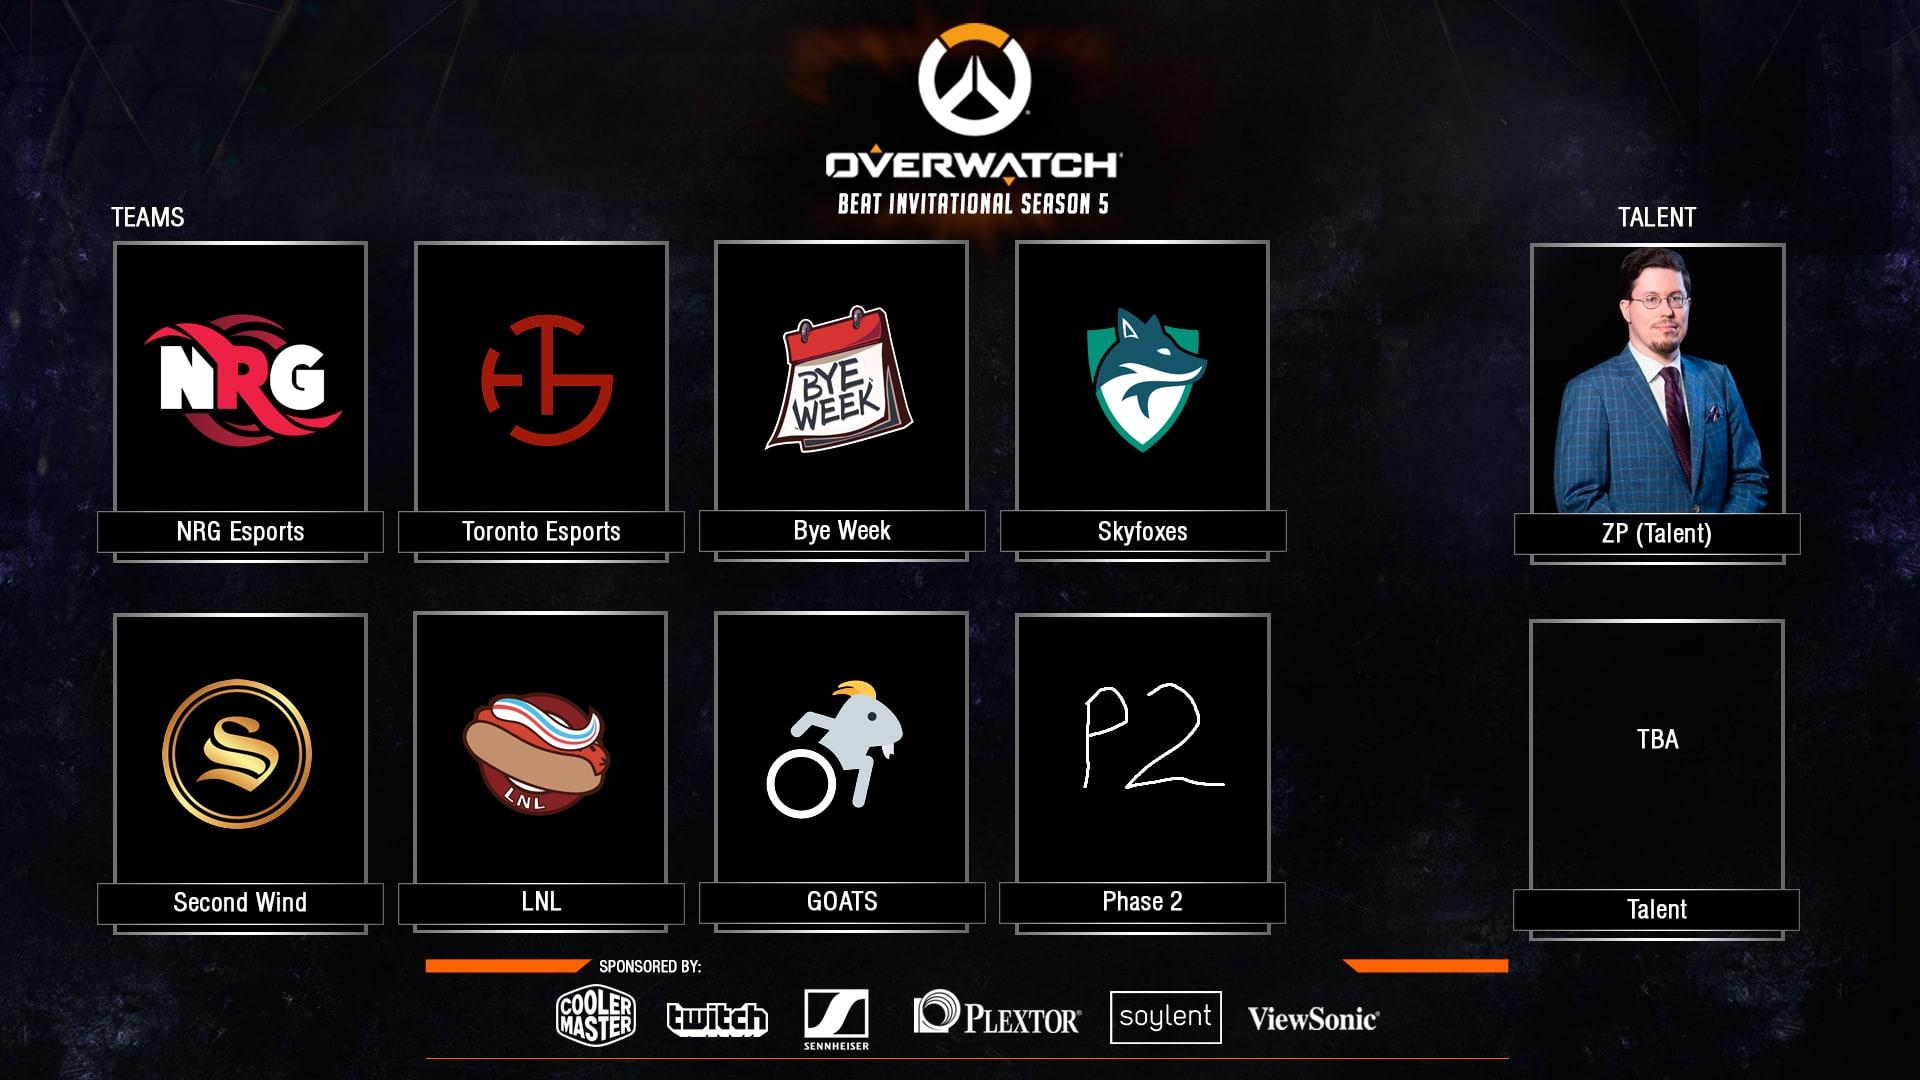 Overwatch BEAT Invitational Season 5 (GOATS & Phase 2 in)